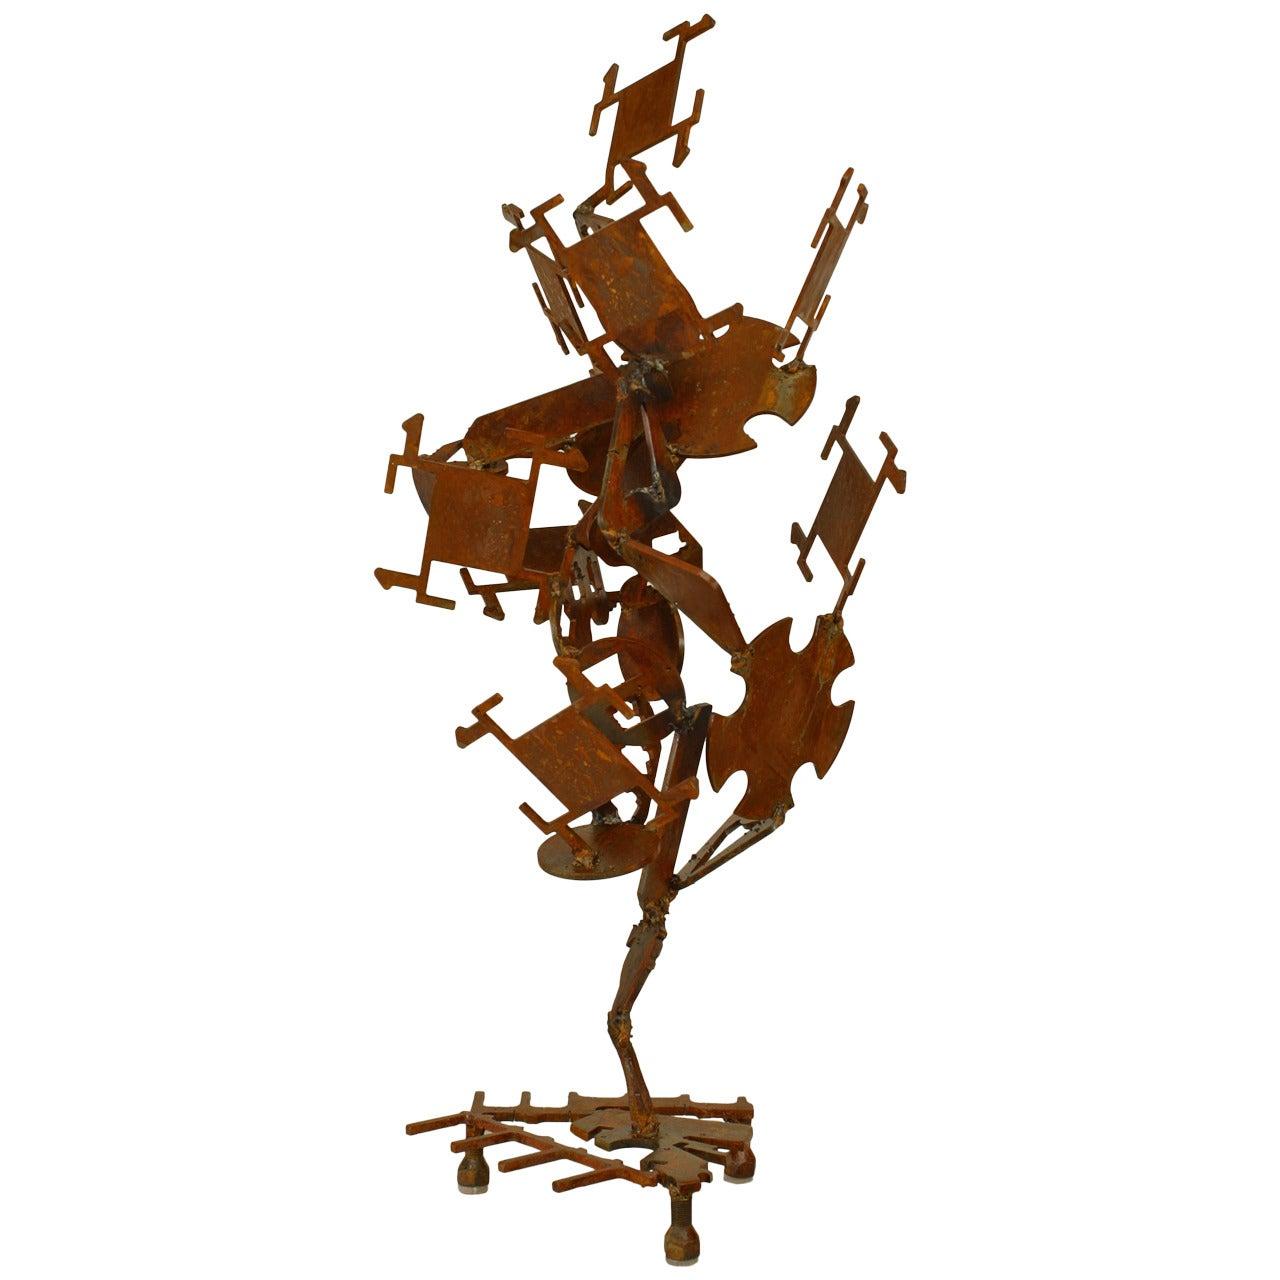 American Post-War Brutalist Abstract Sculpture